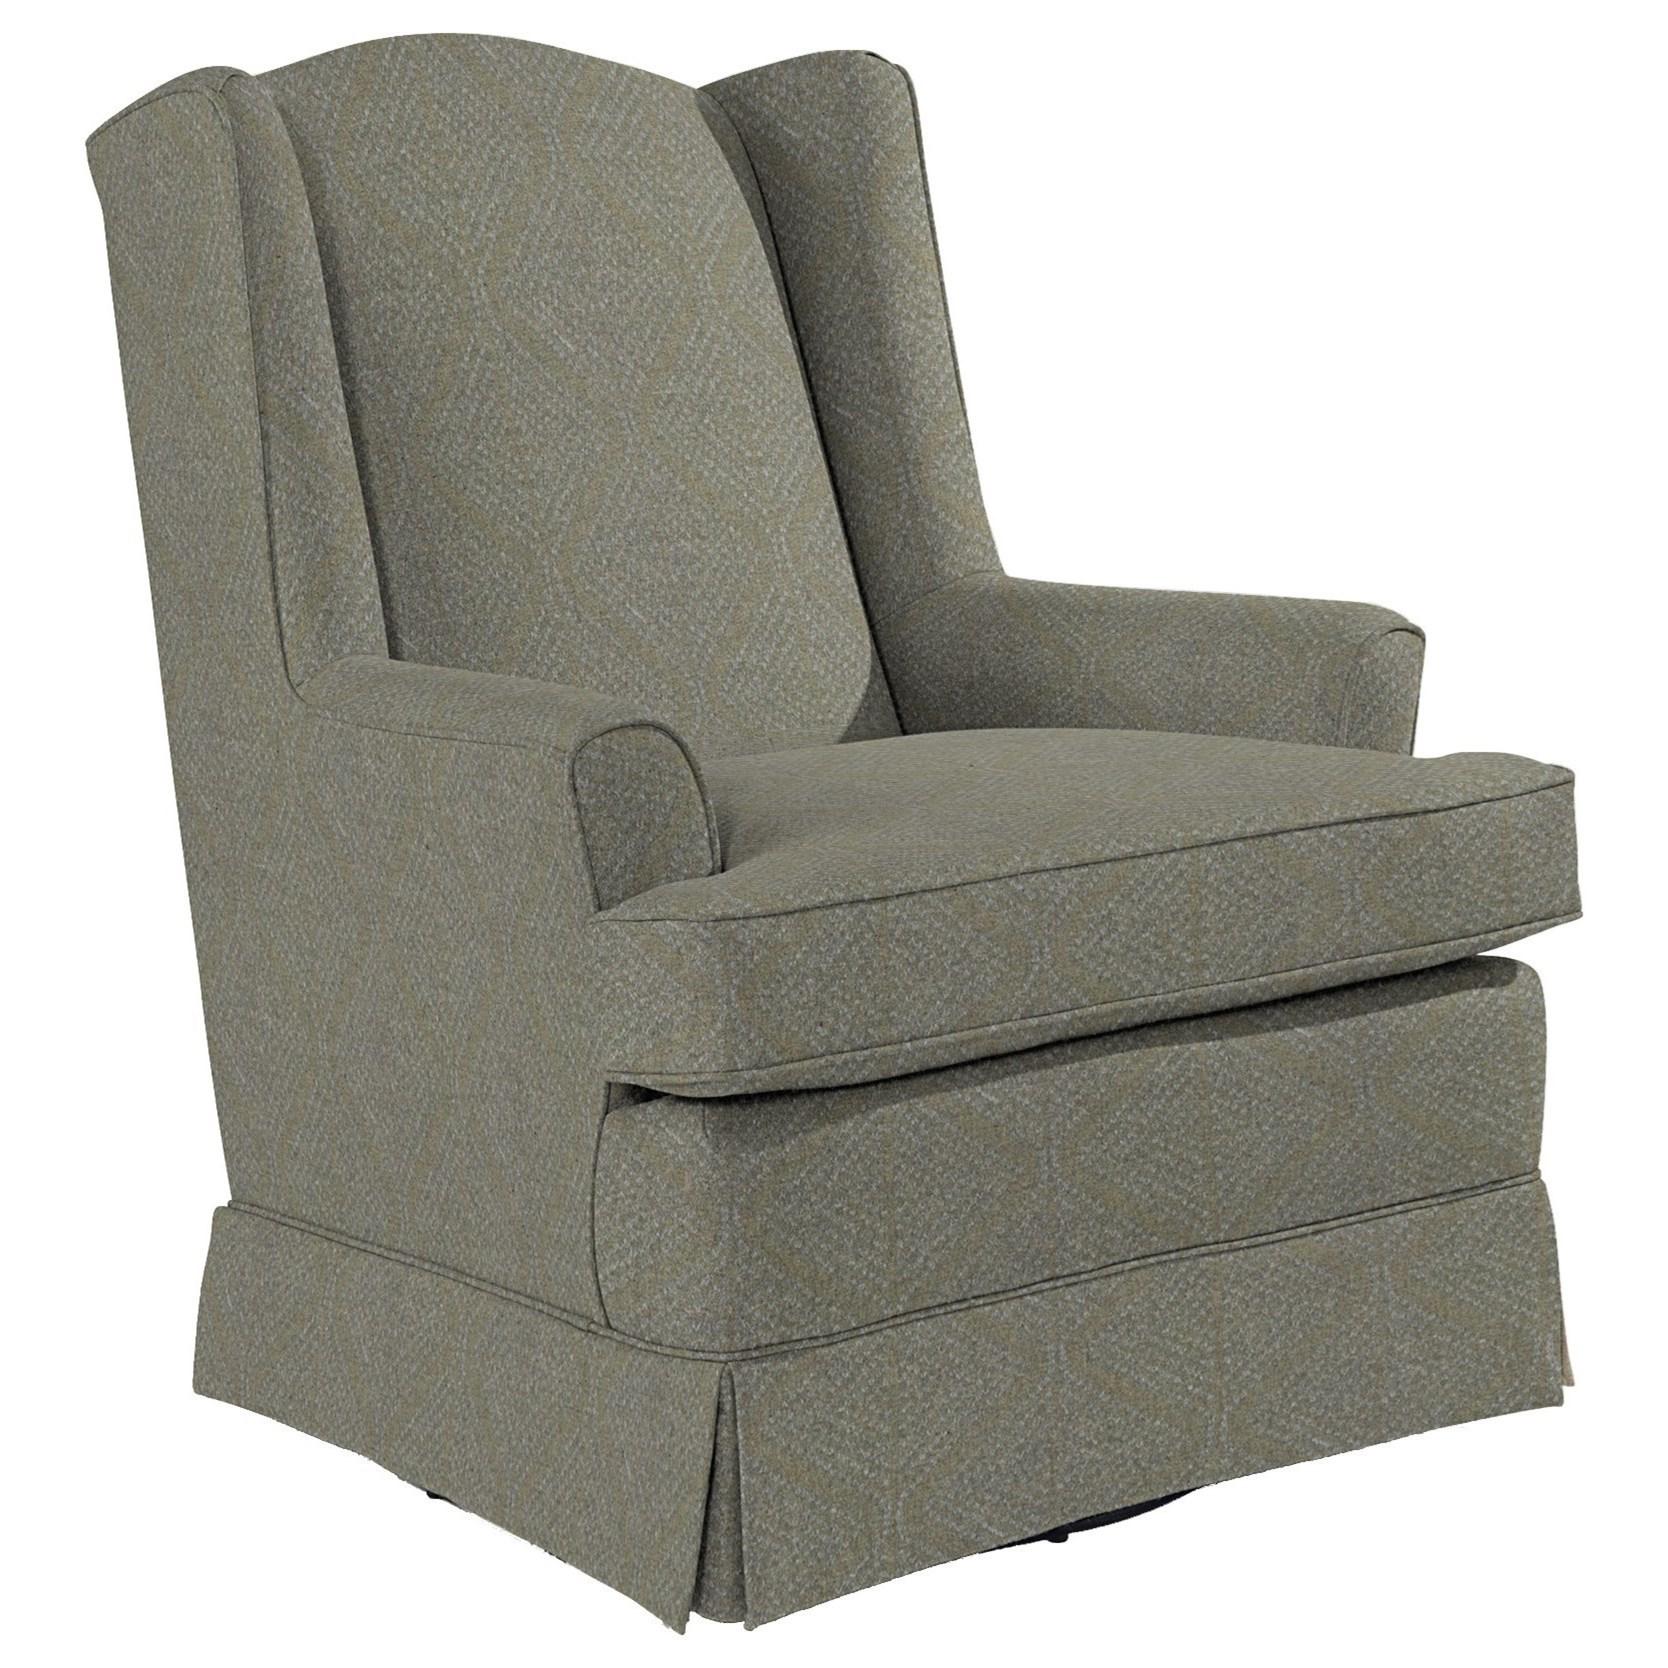 Best Home Furnishings Chairs - Swivel Glide Natasha Swivel Glider - Item Number: 7147-34573